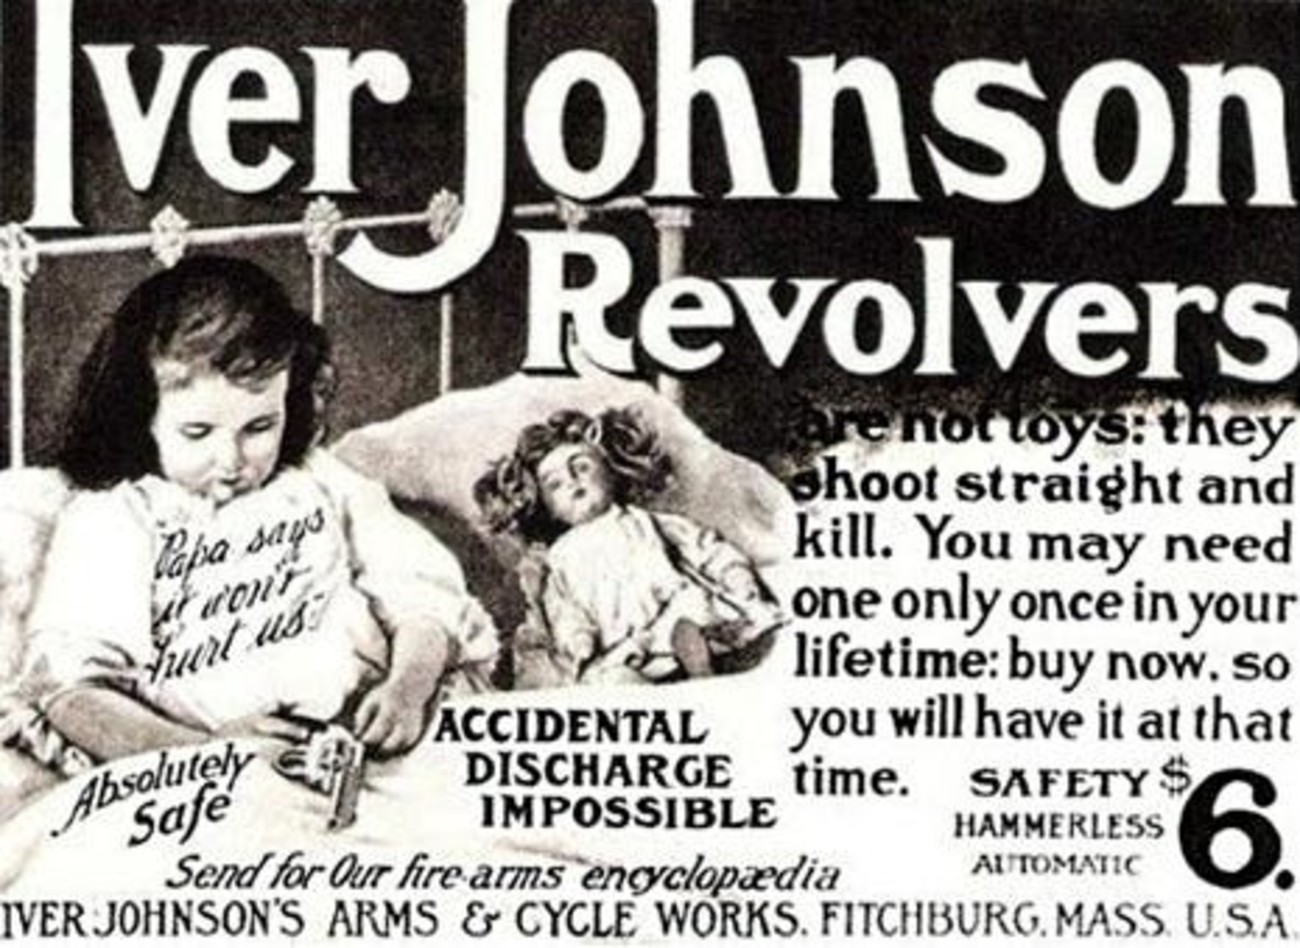 Old gun ad involving kids